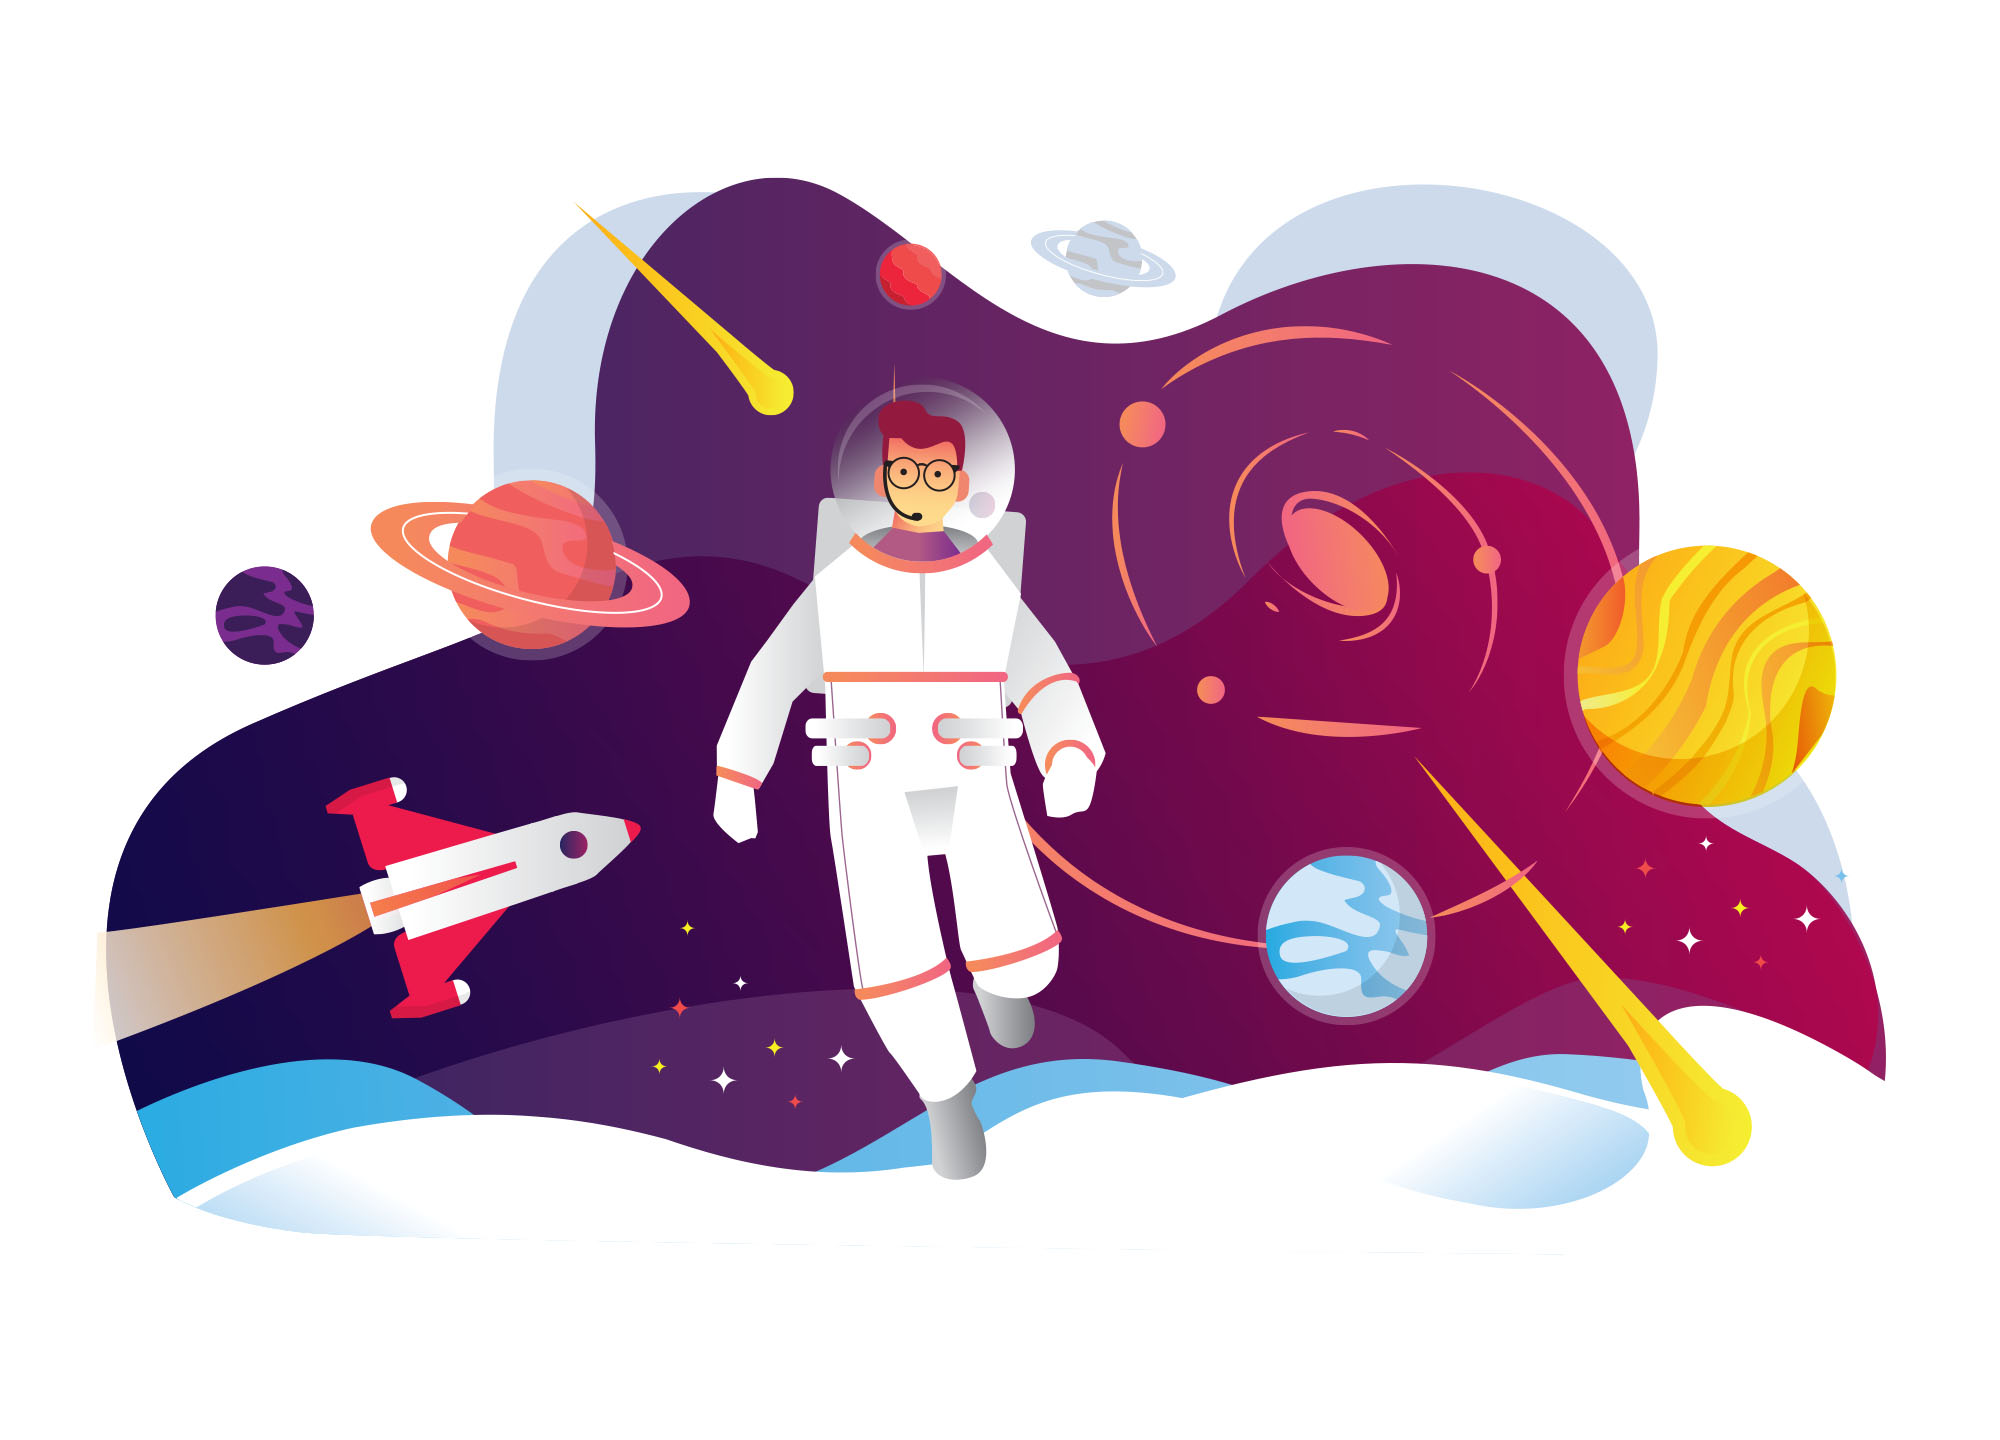 Konsep Astronaut Illustration